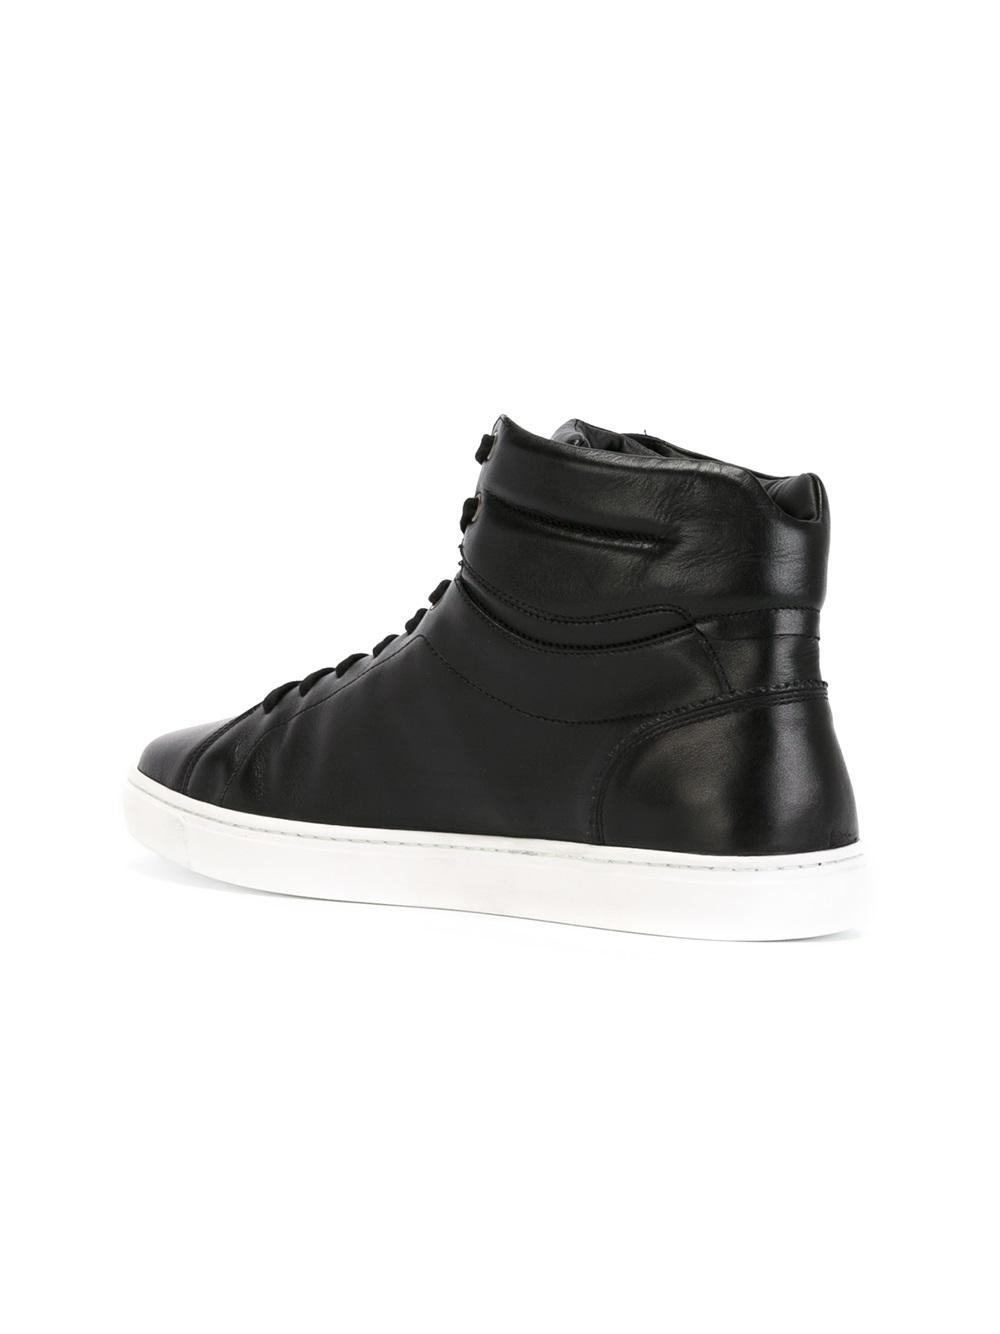 lyst dolce gabbana leather sneakers in black for men. Black Bedroom Furniture Sets. Home Design Ideas